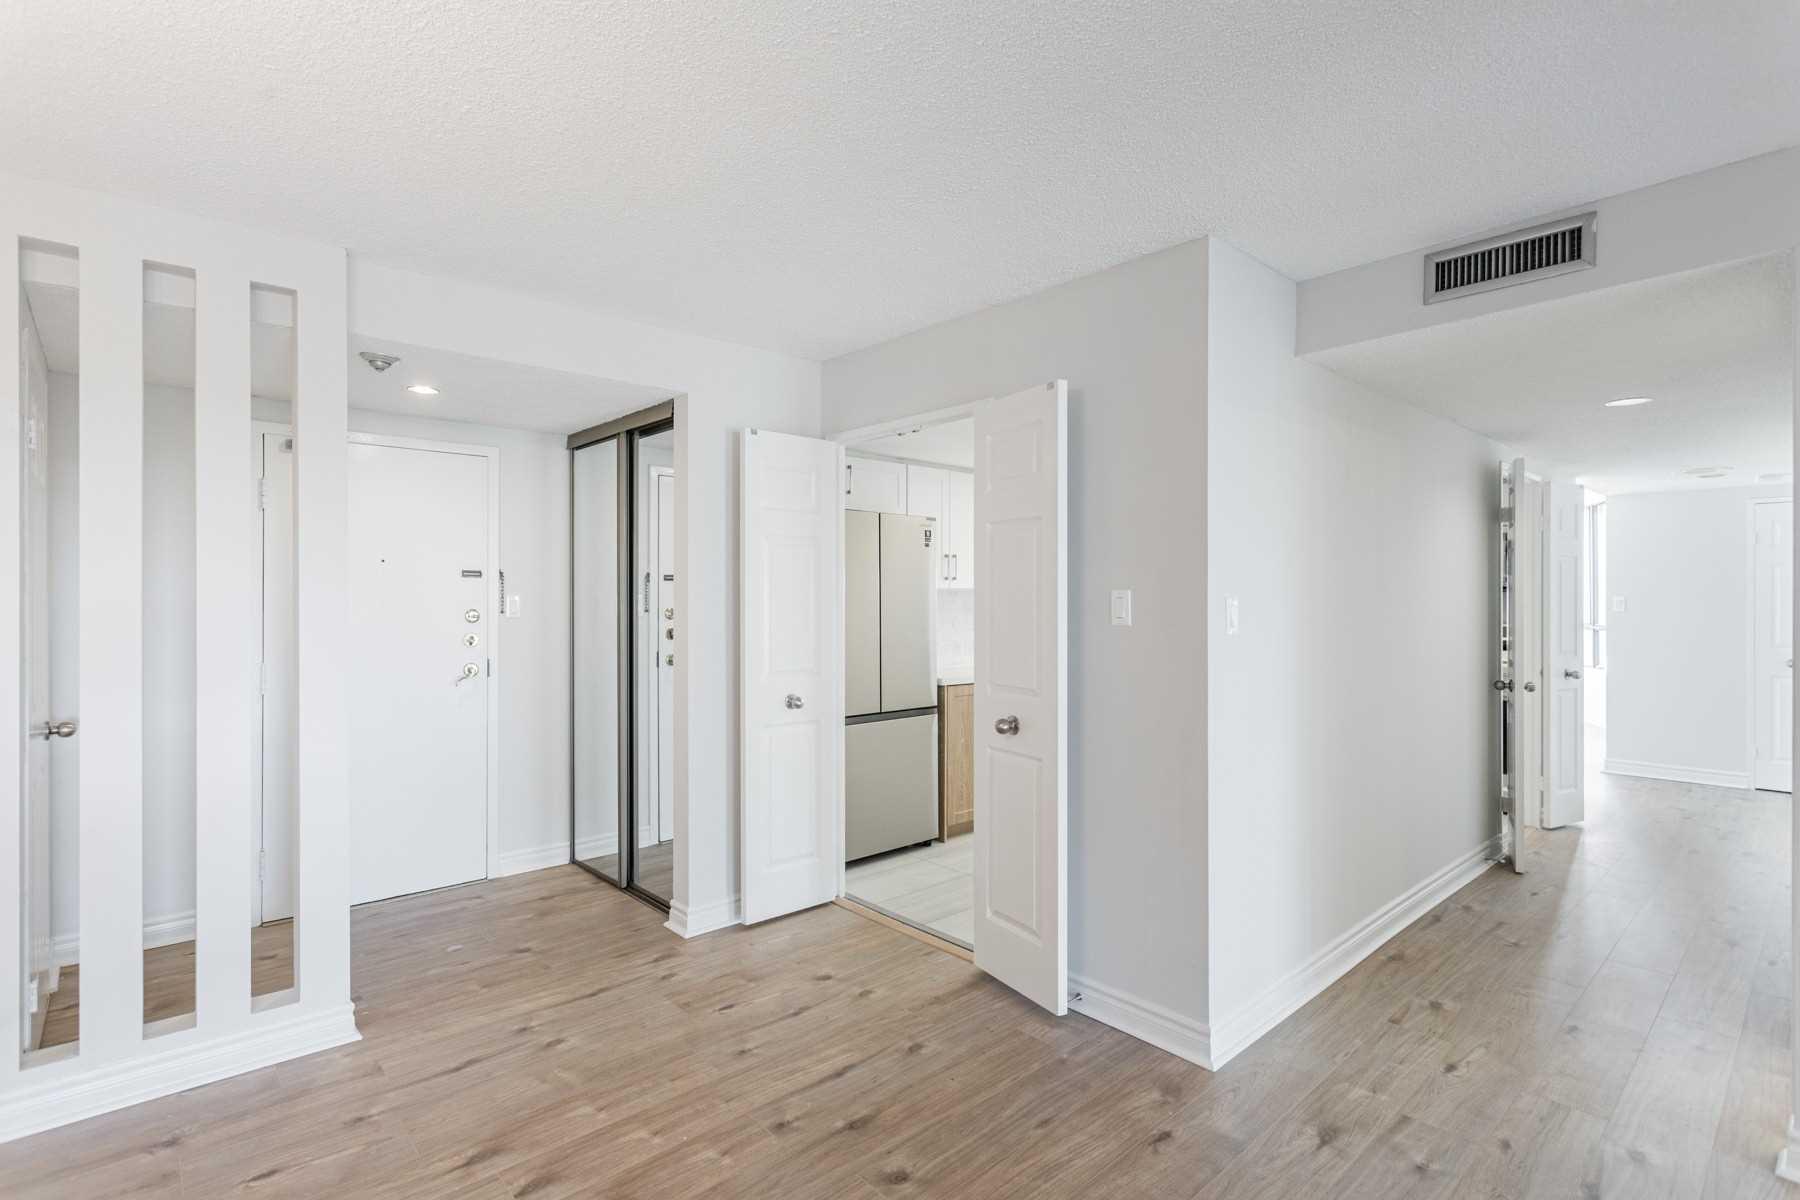 Condo Apt For Sale In Toronto , 2 Bedrooms Bedrooms, ,2 BathroomsBathrooms,Condo Apt,For Sale,704,Bamburgh